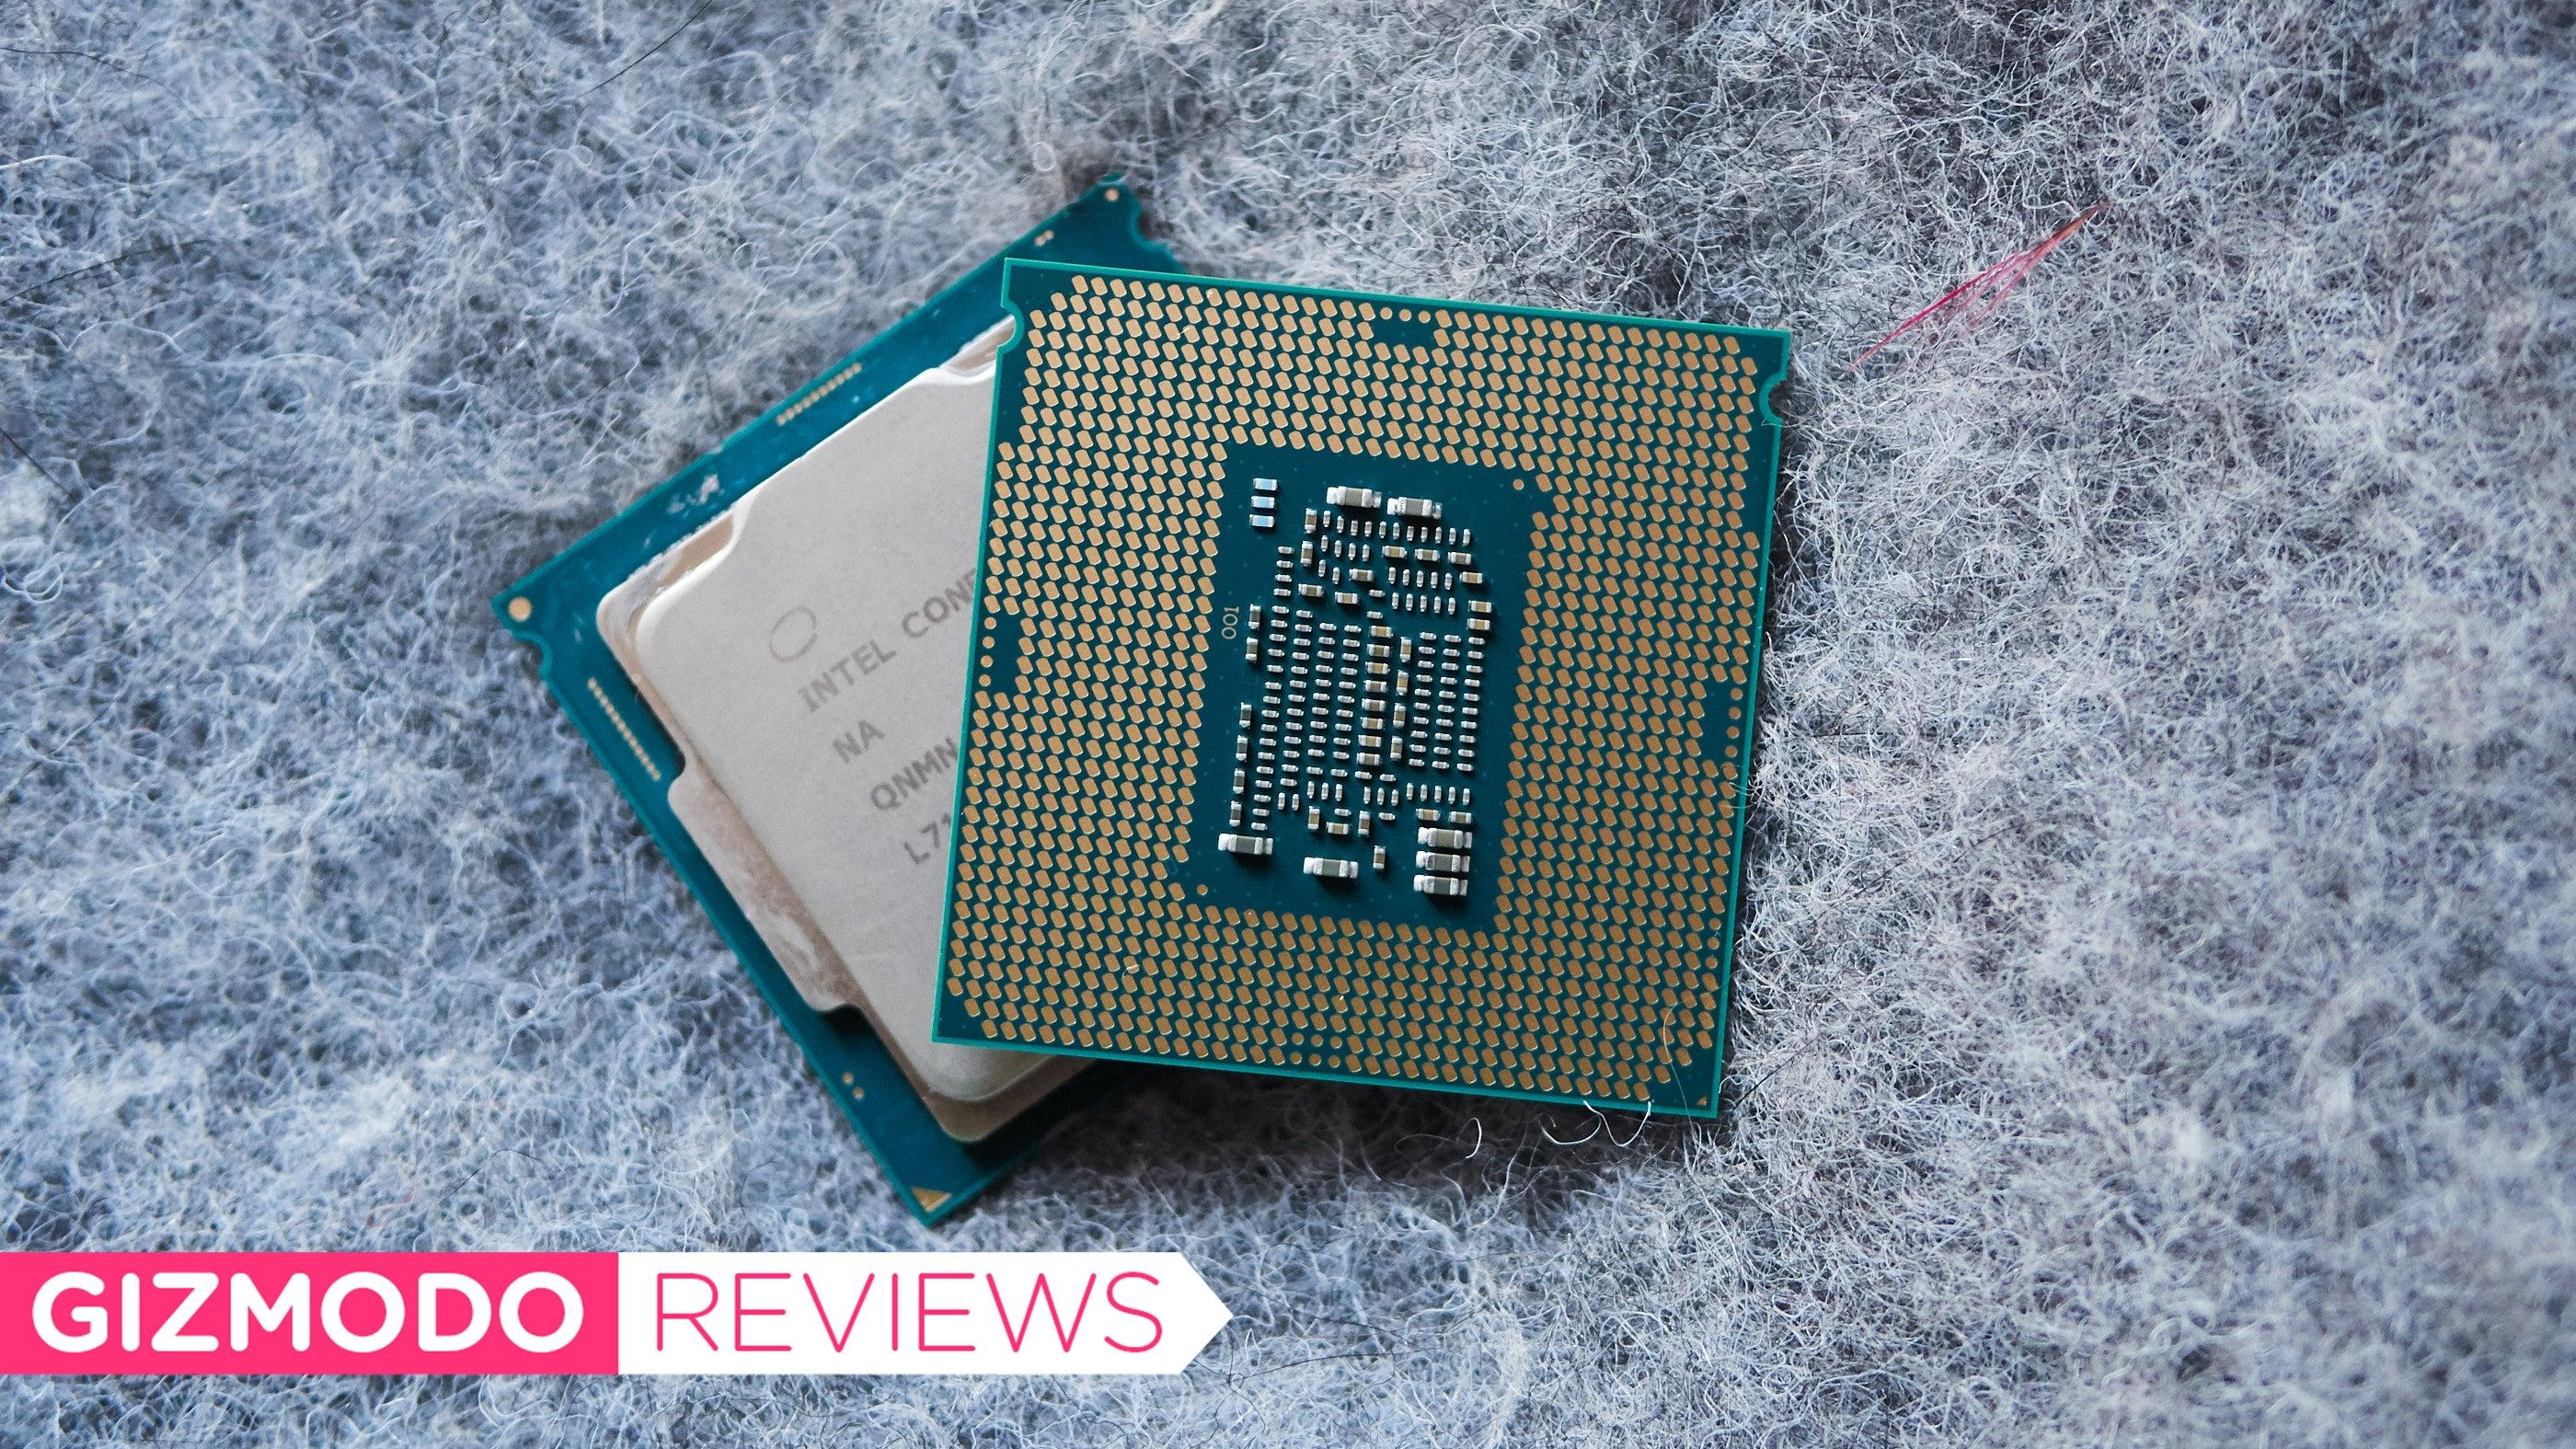 Intel's New Core i7 CPUs: The Gizmodo Review